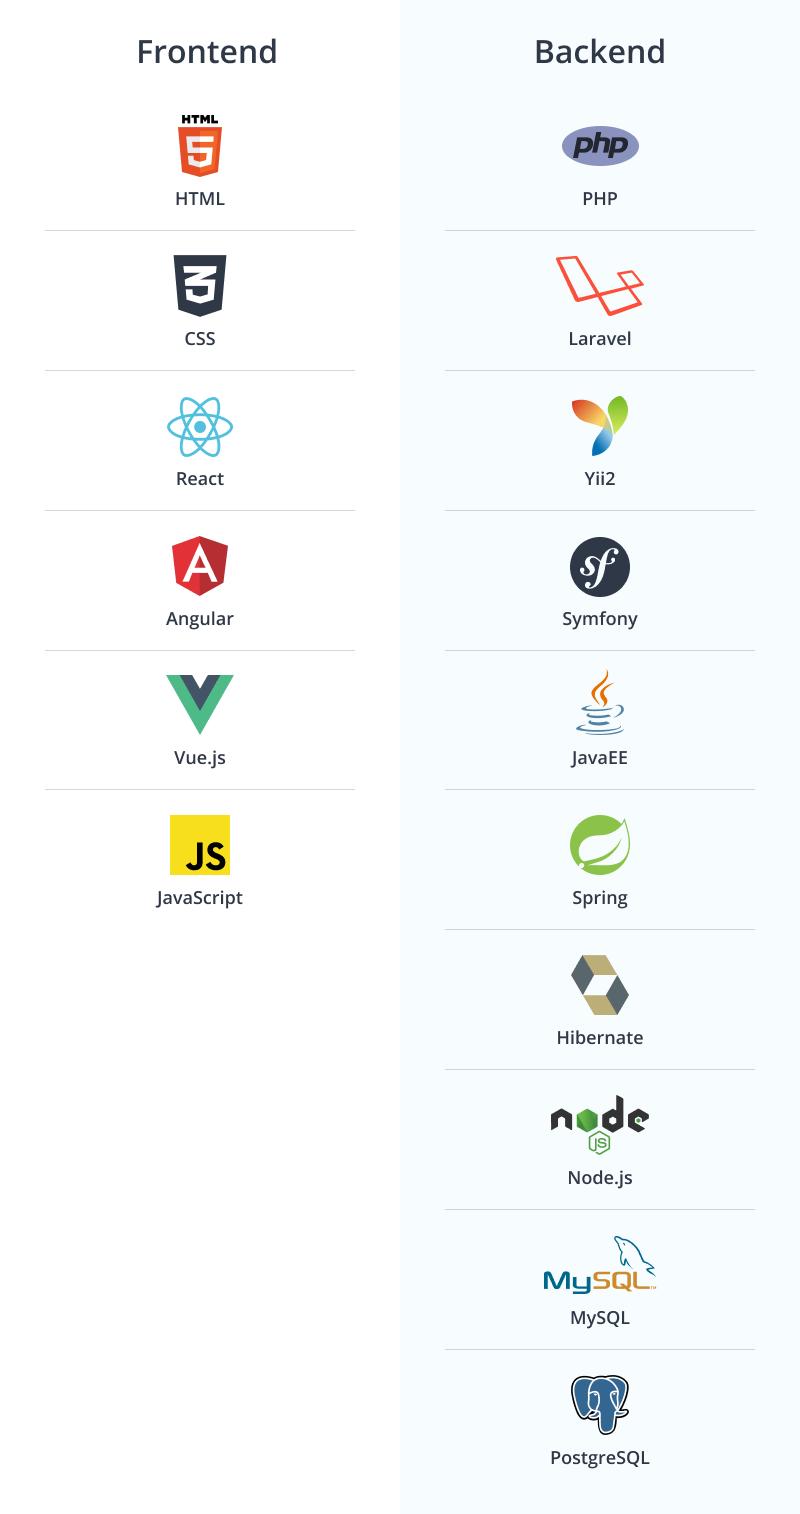 Web development stack at Azoft